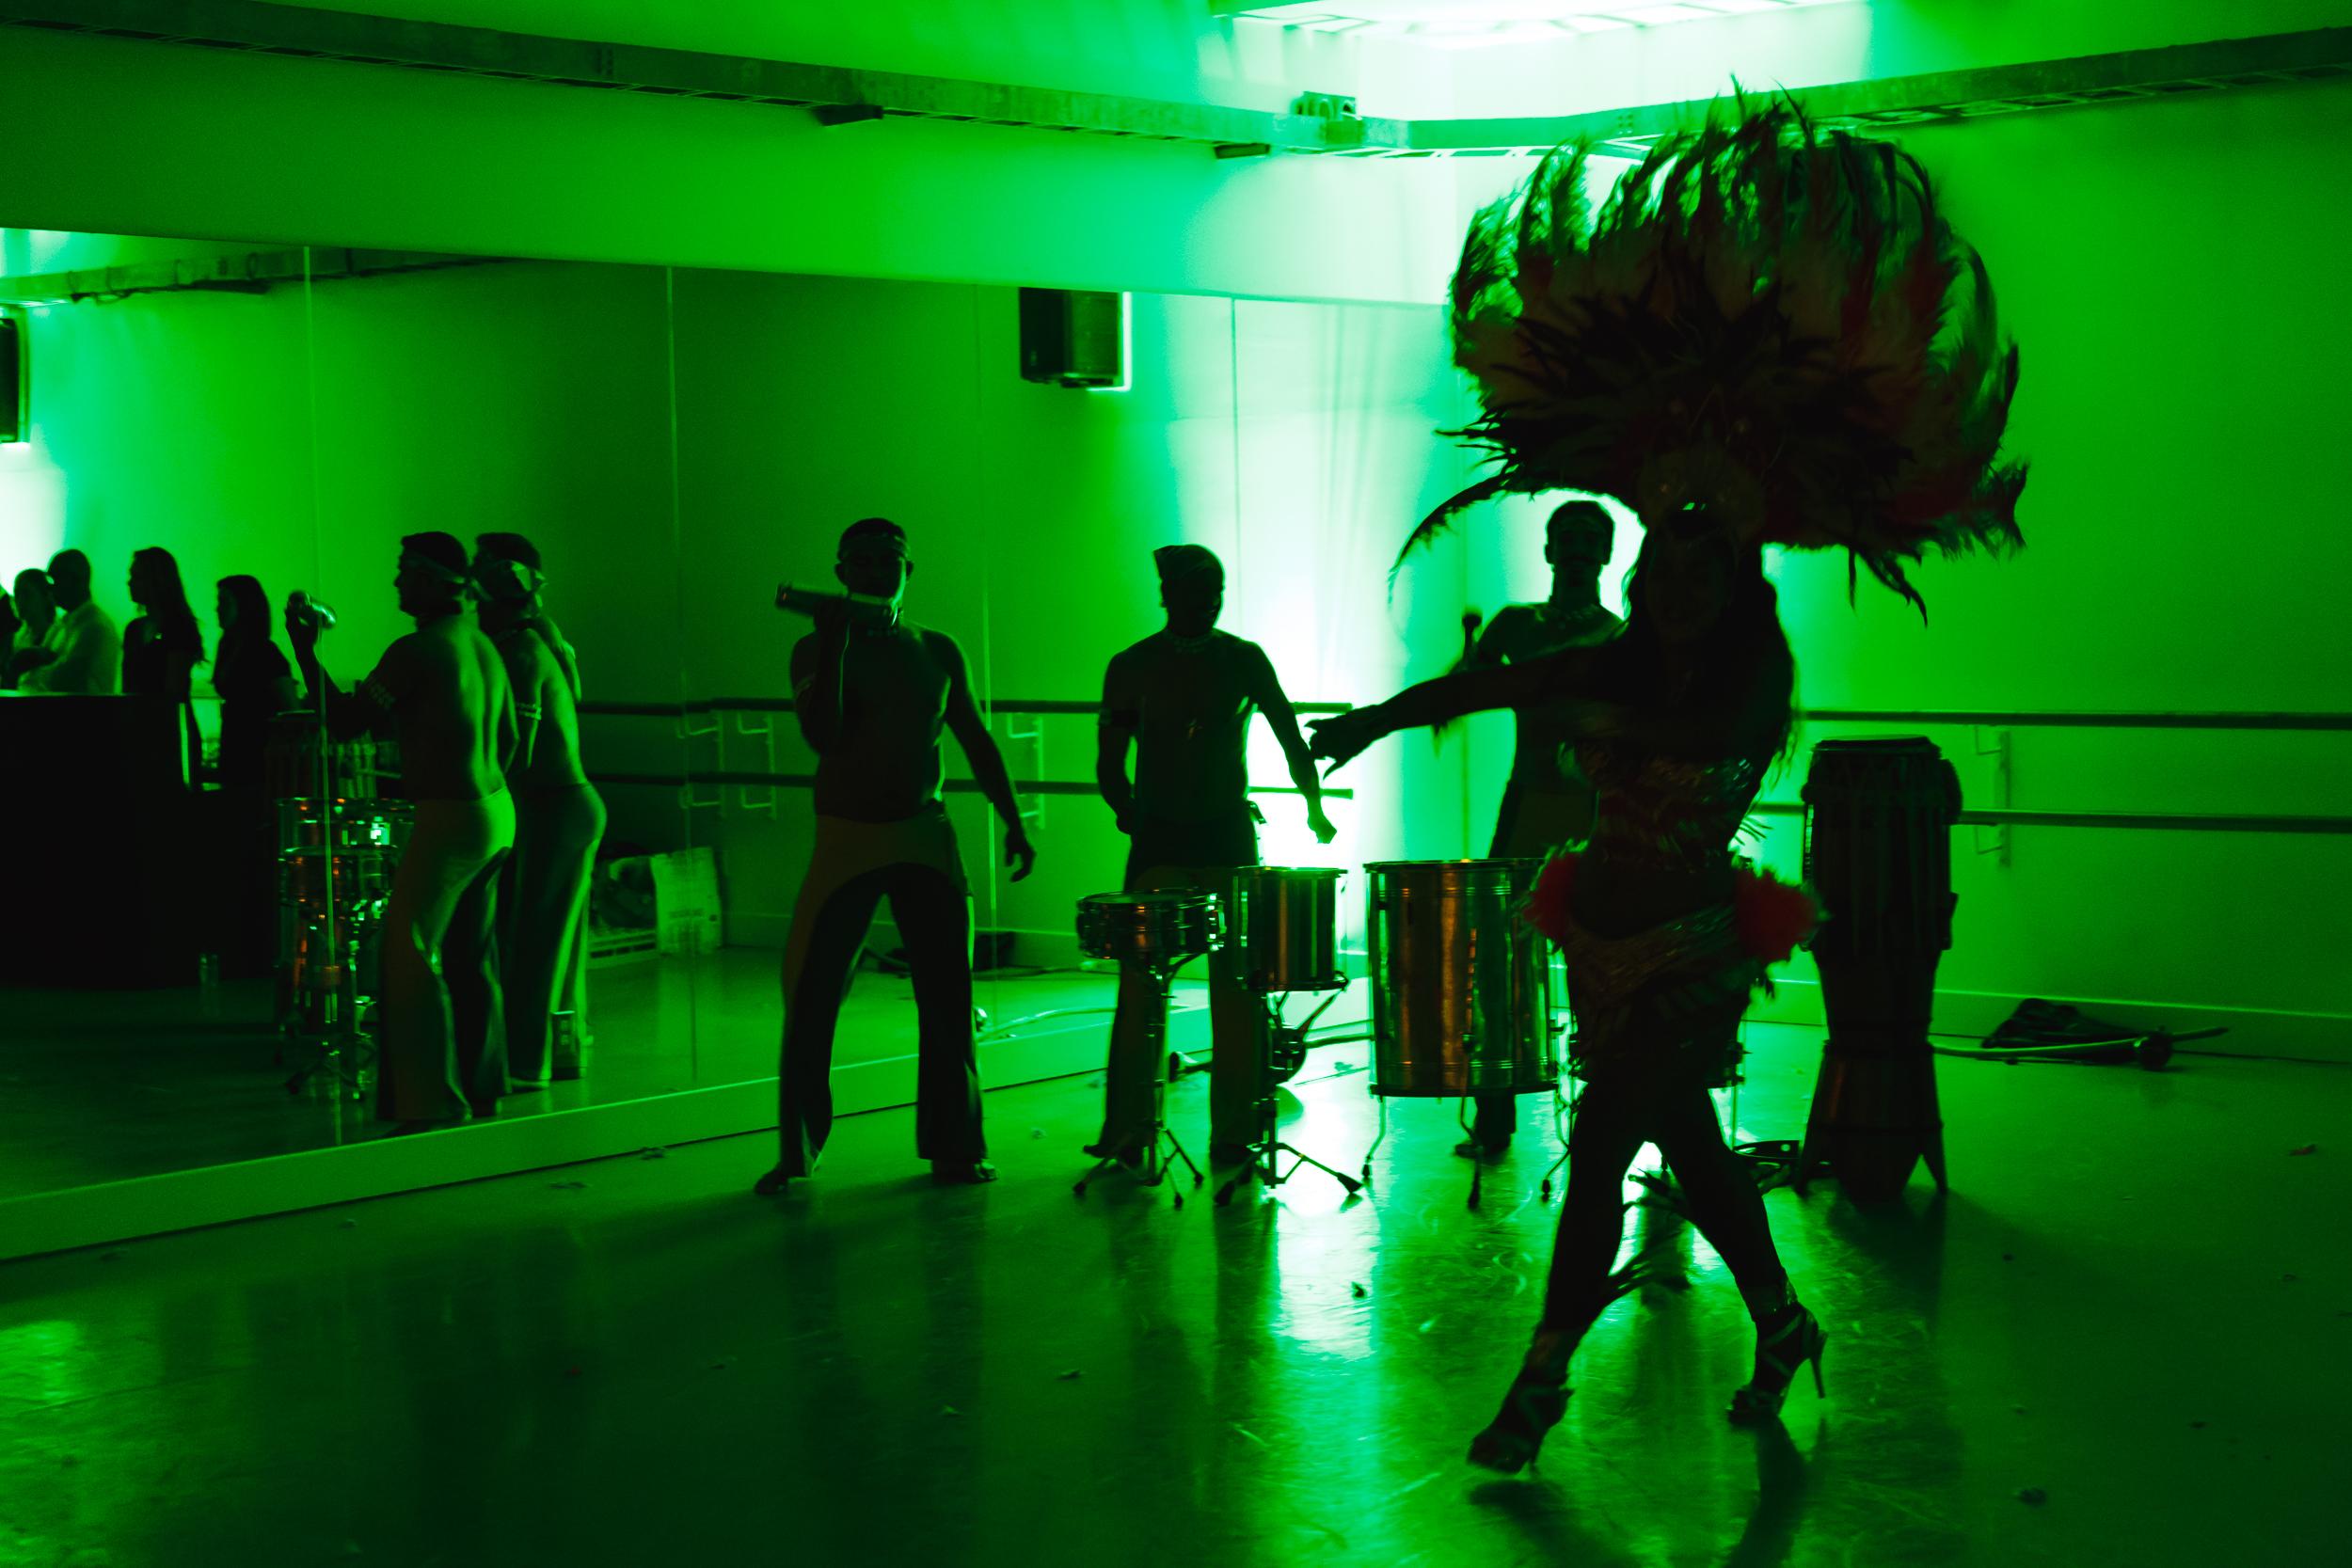 Scotiabank-Dance-Hotel-image16.jpg